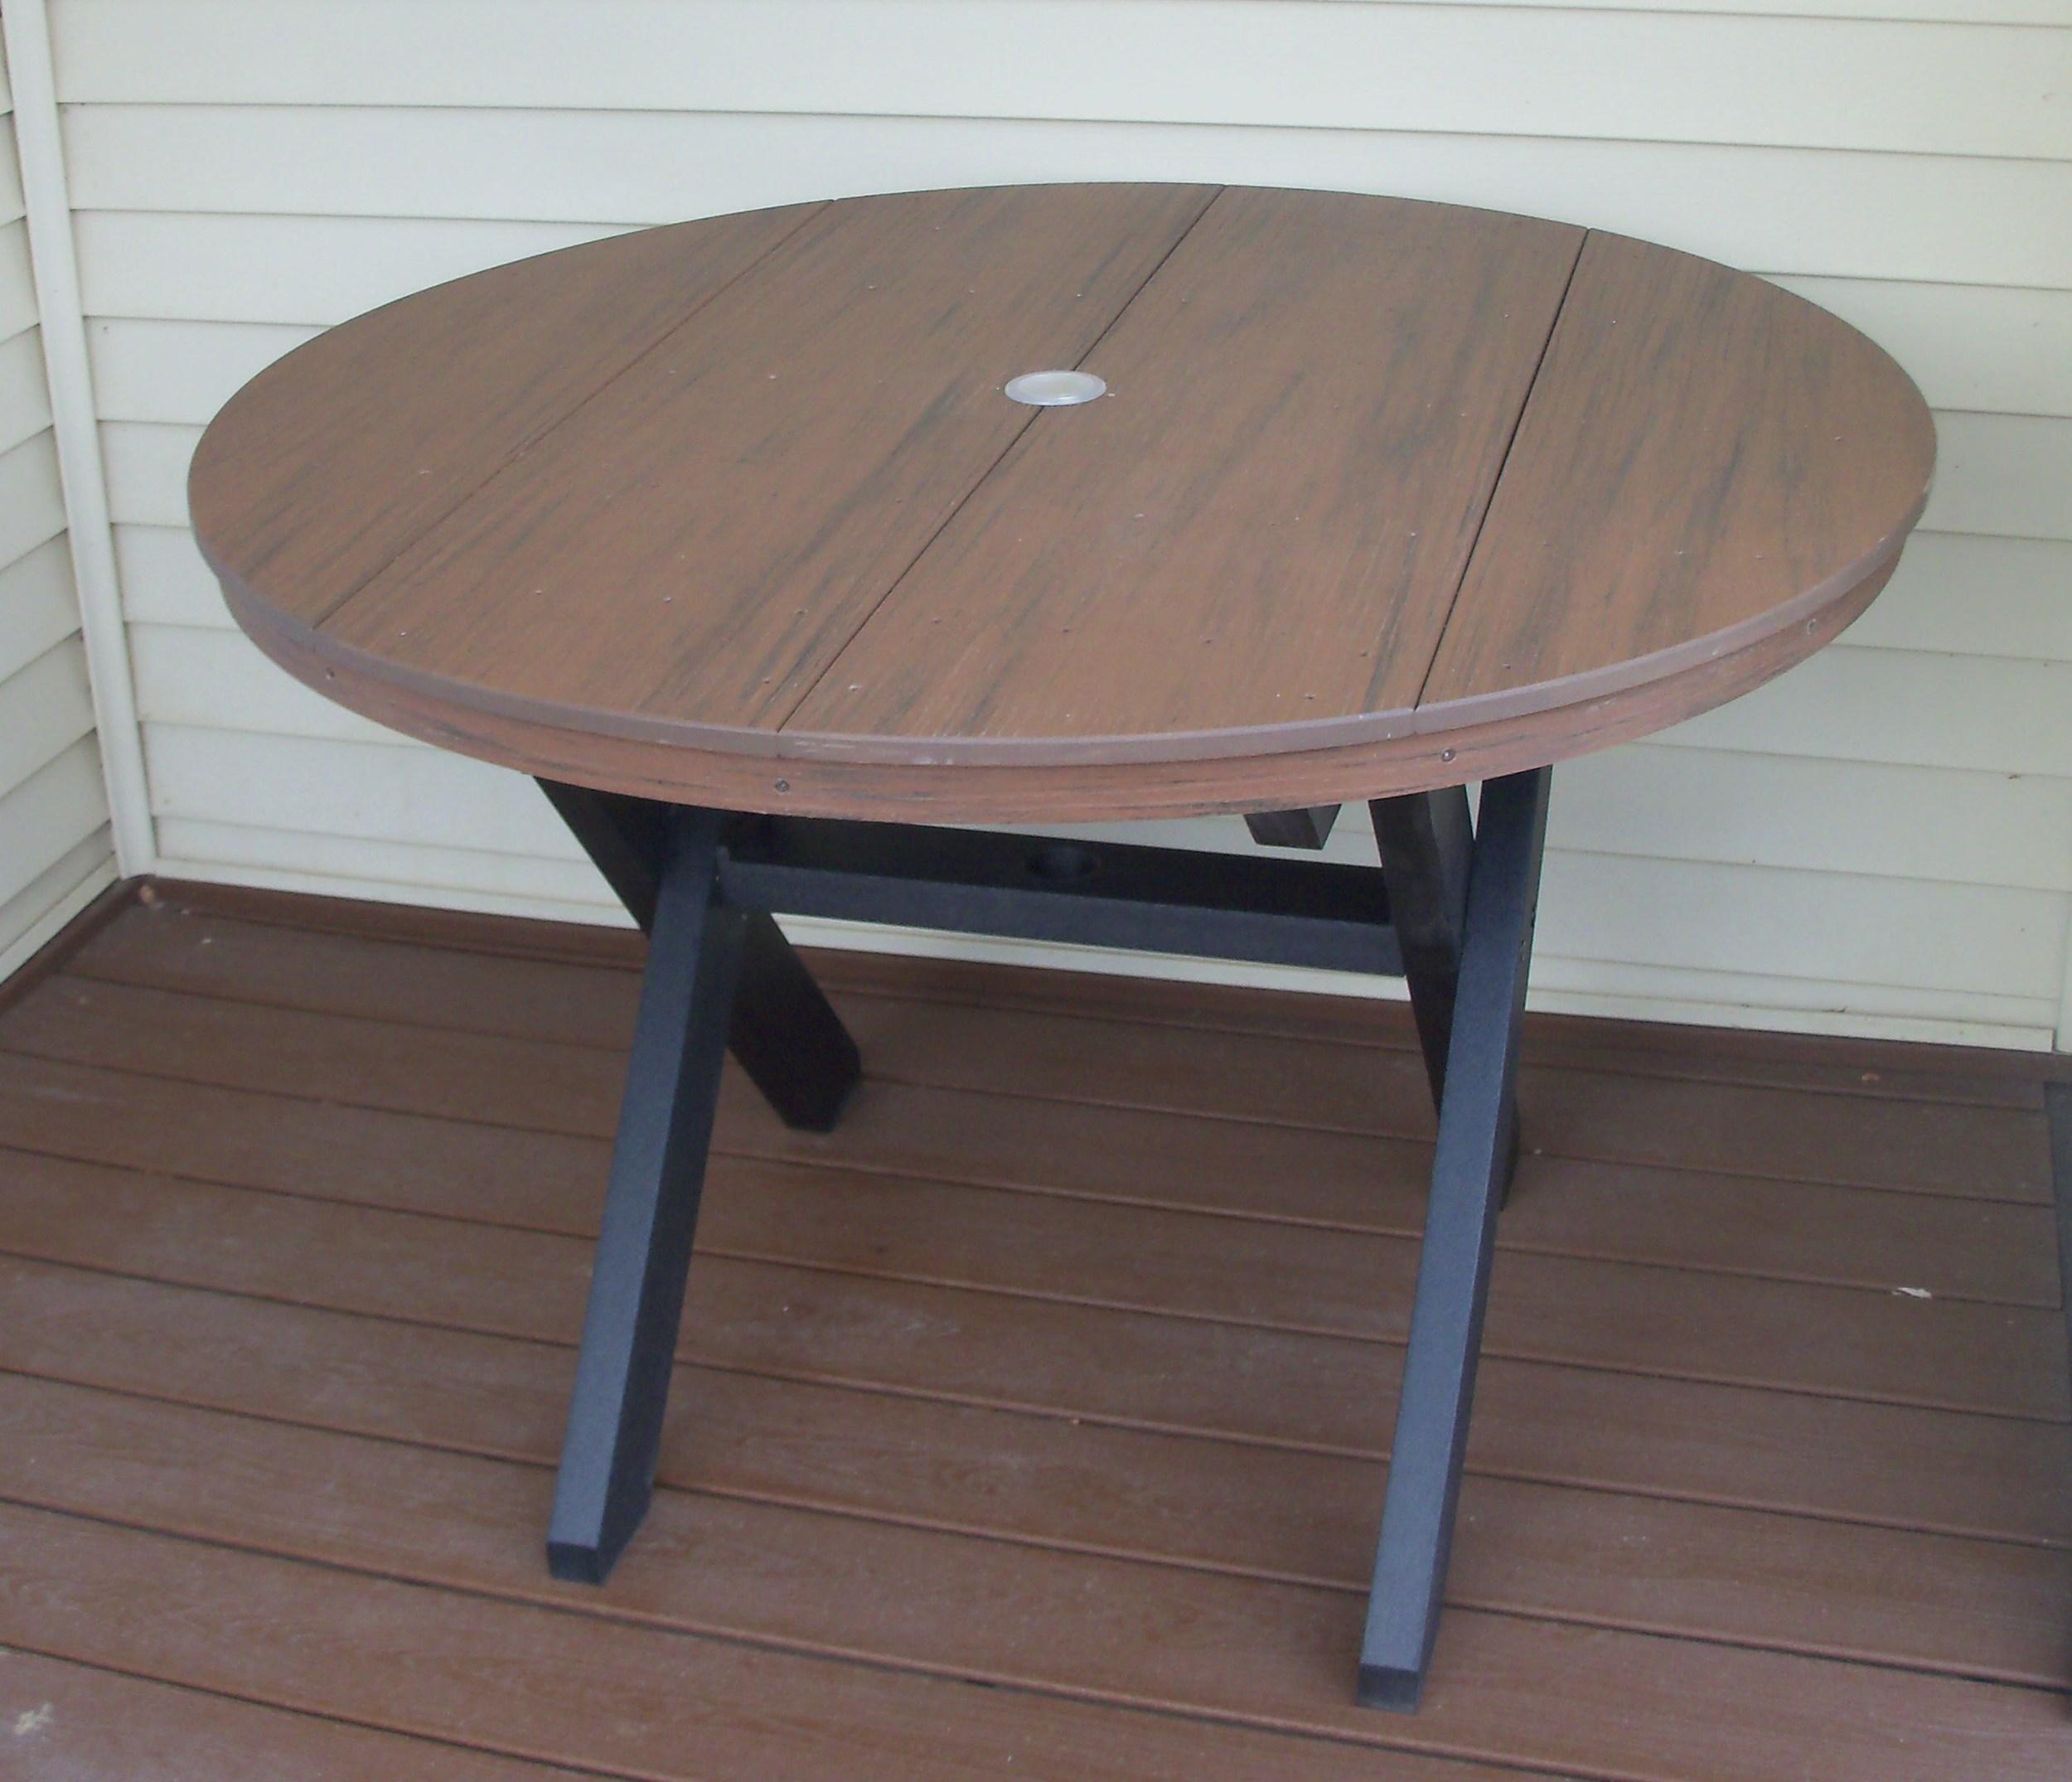 TimberTech Table